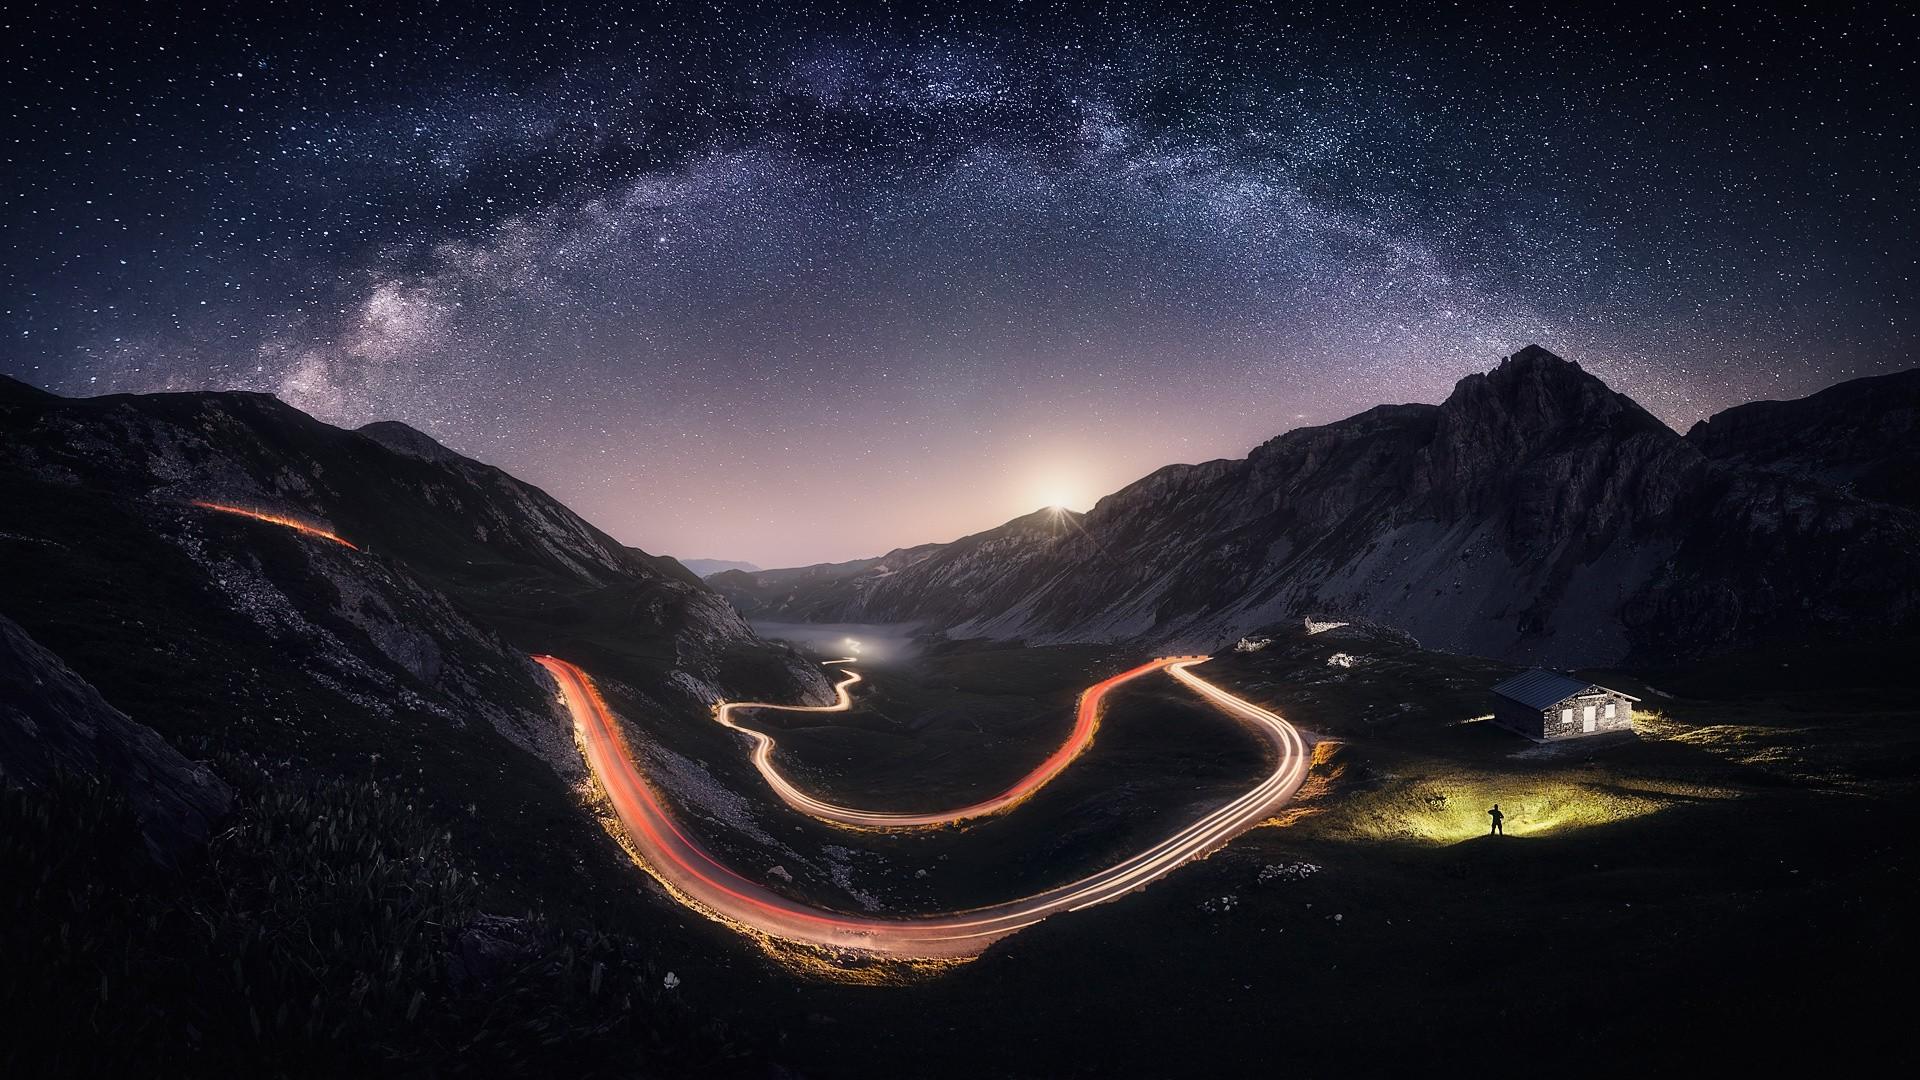 Hintergrundbilder : Landschaft, Beleuchtung, Italien, Nacht-, Planet ...